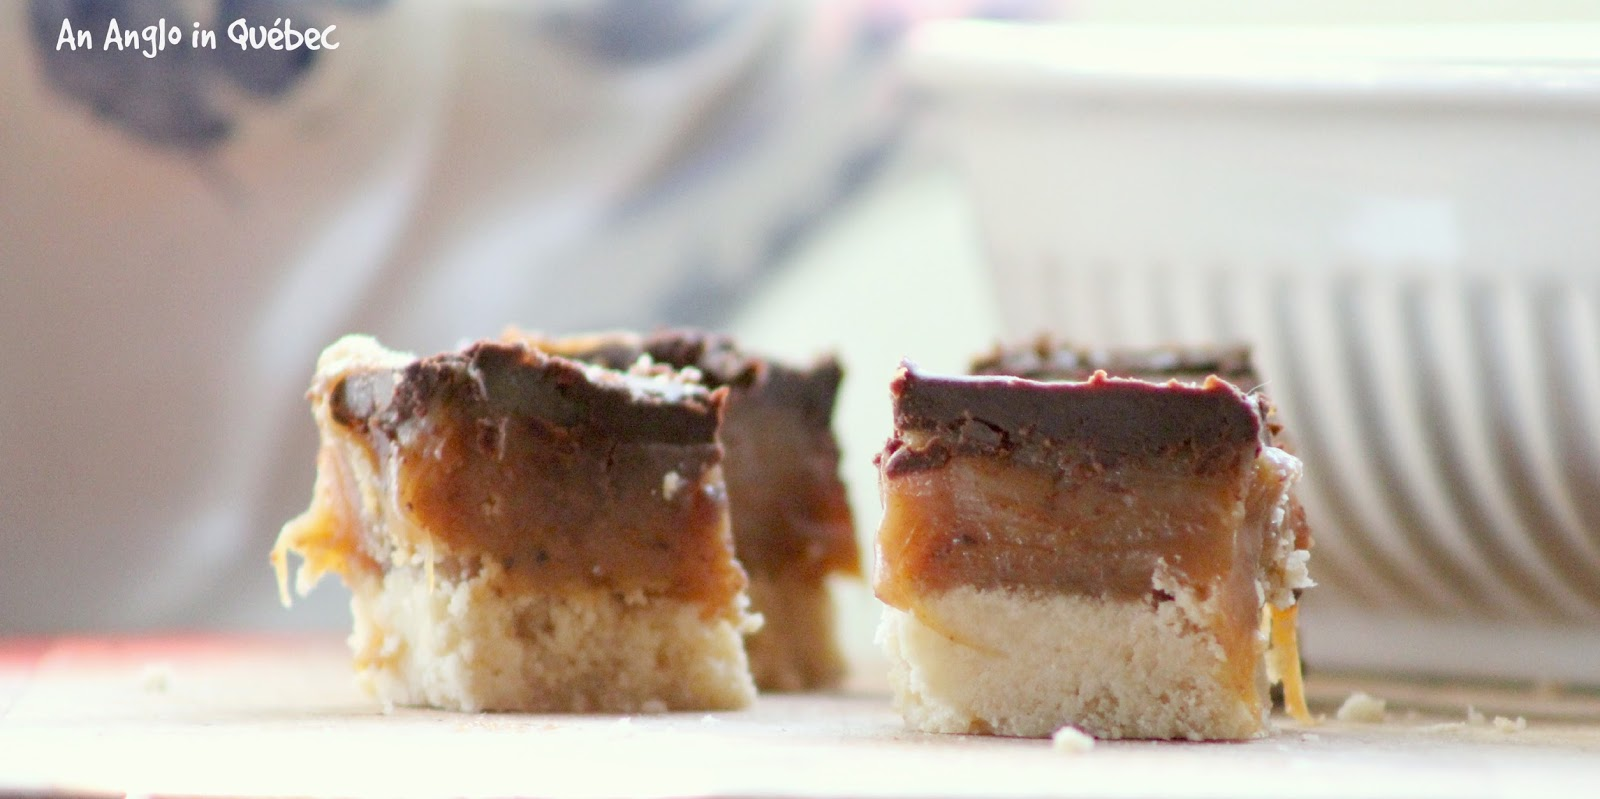 http://anangloinquebec.blogspot.ca/2014/12/salty-chocolate-caramel-bars.html